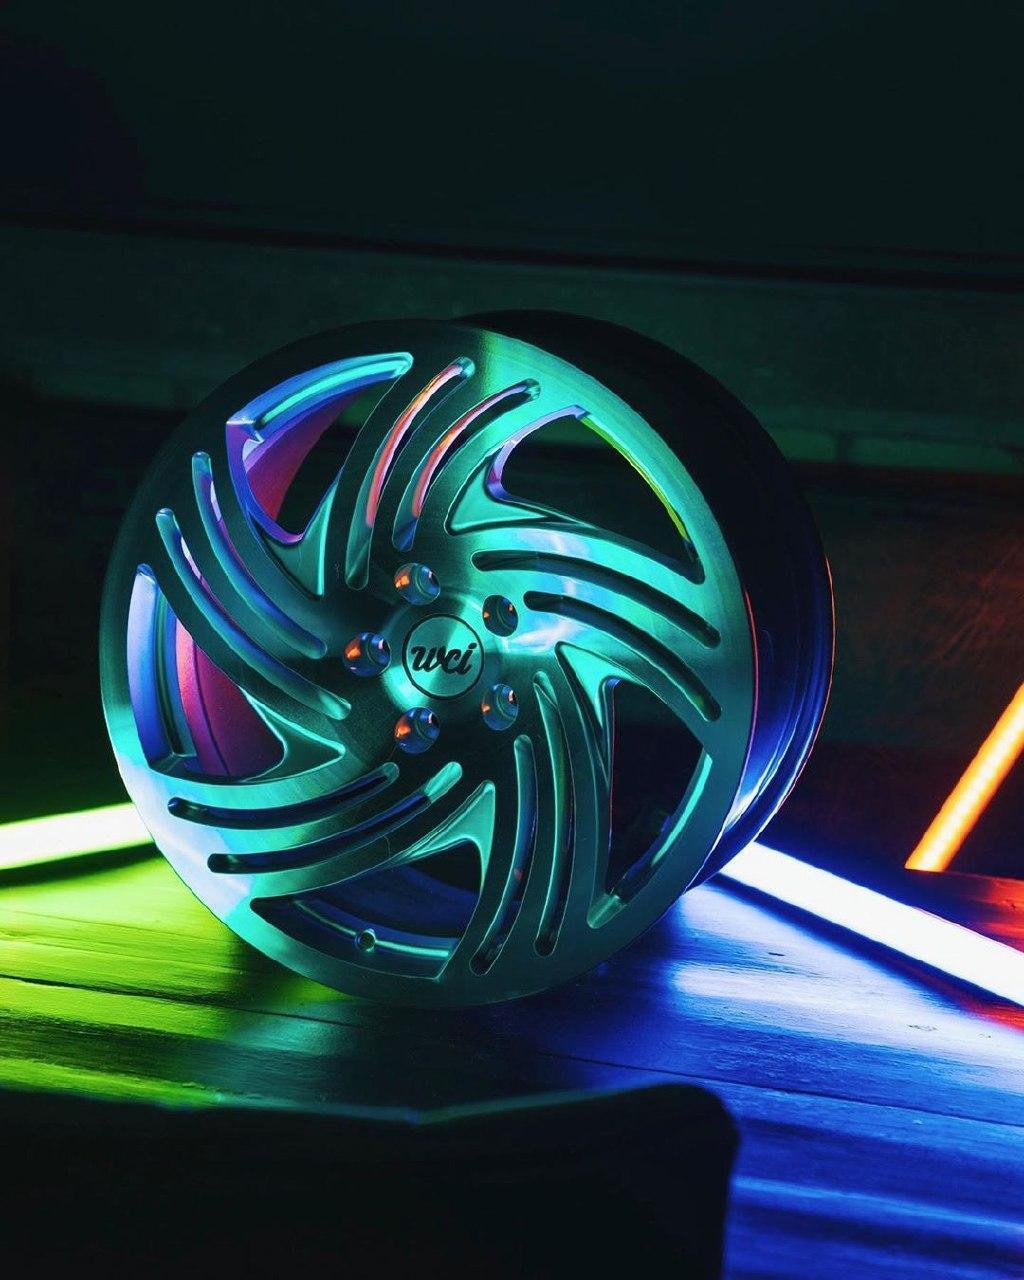 WATERCOOLED SB10 Light Alloy Wheels